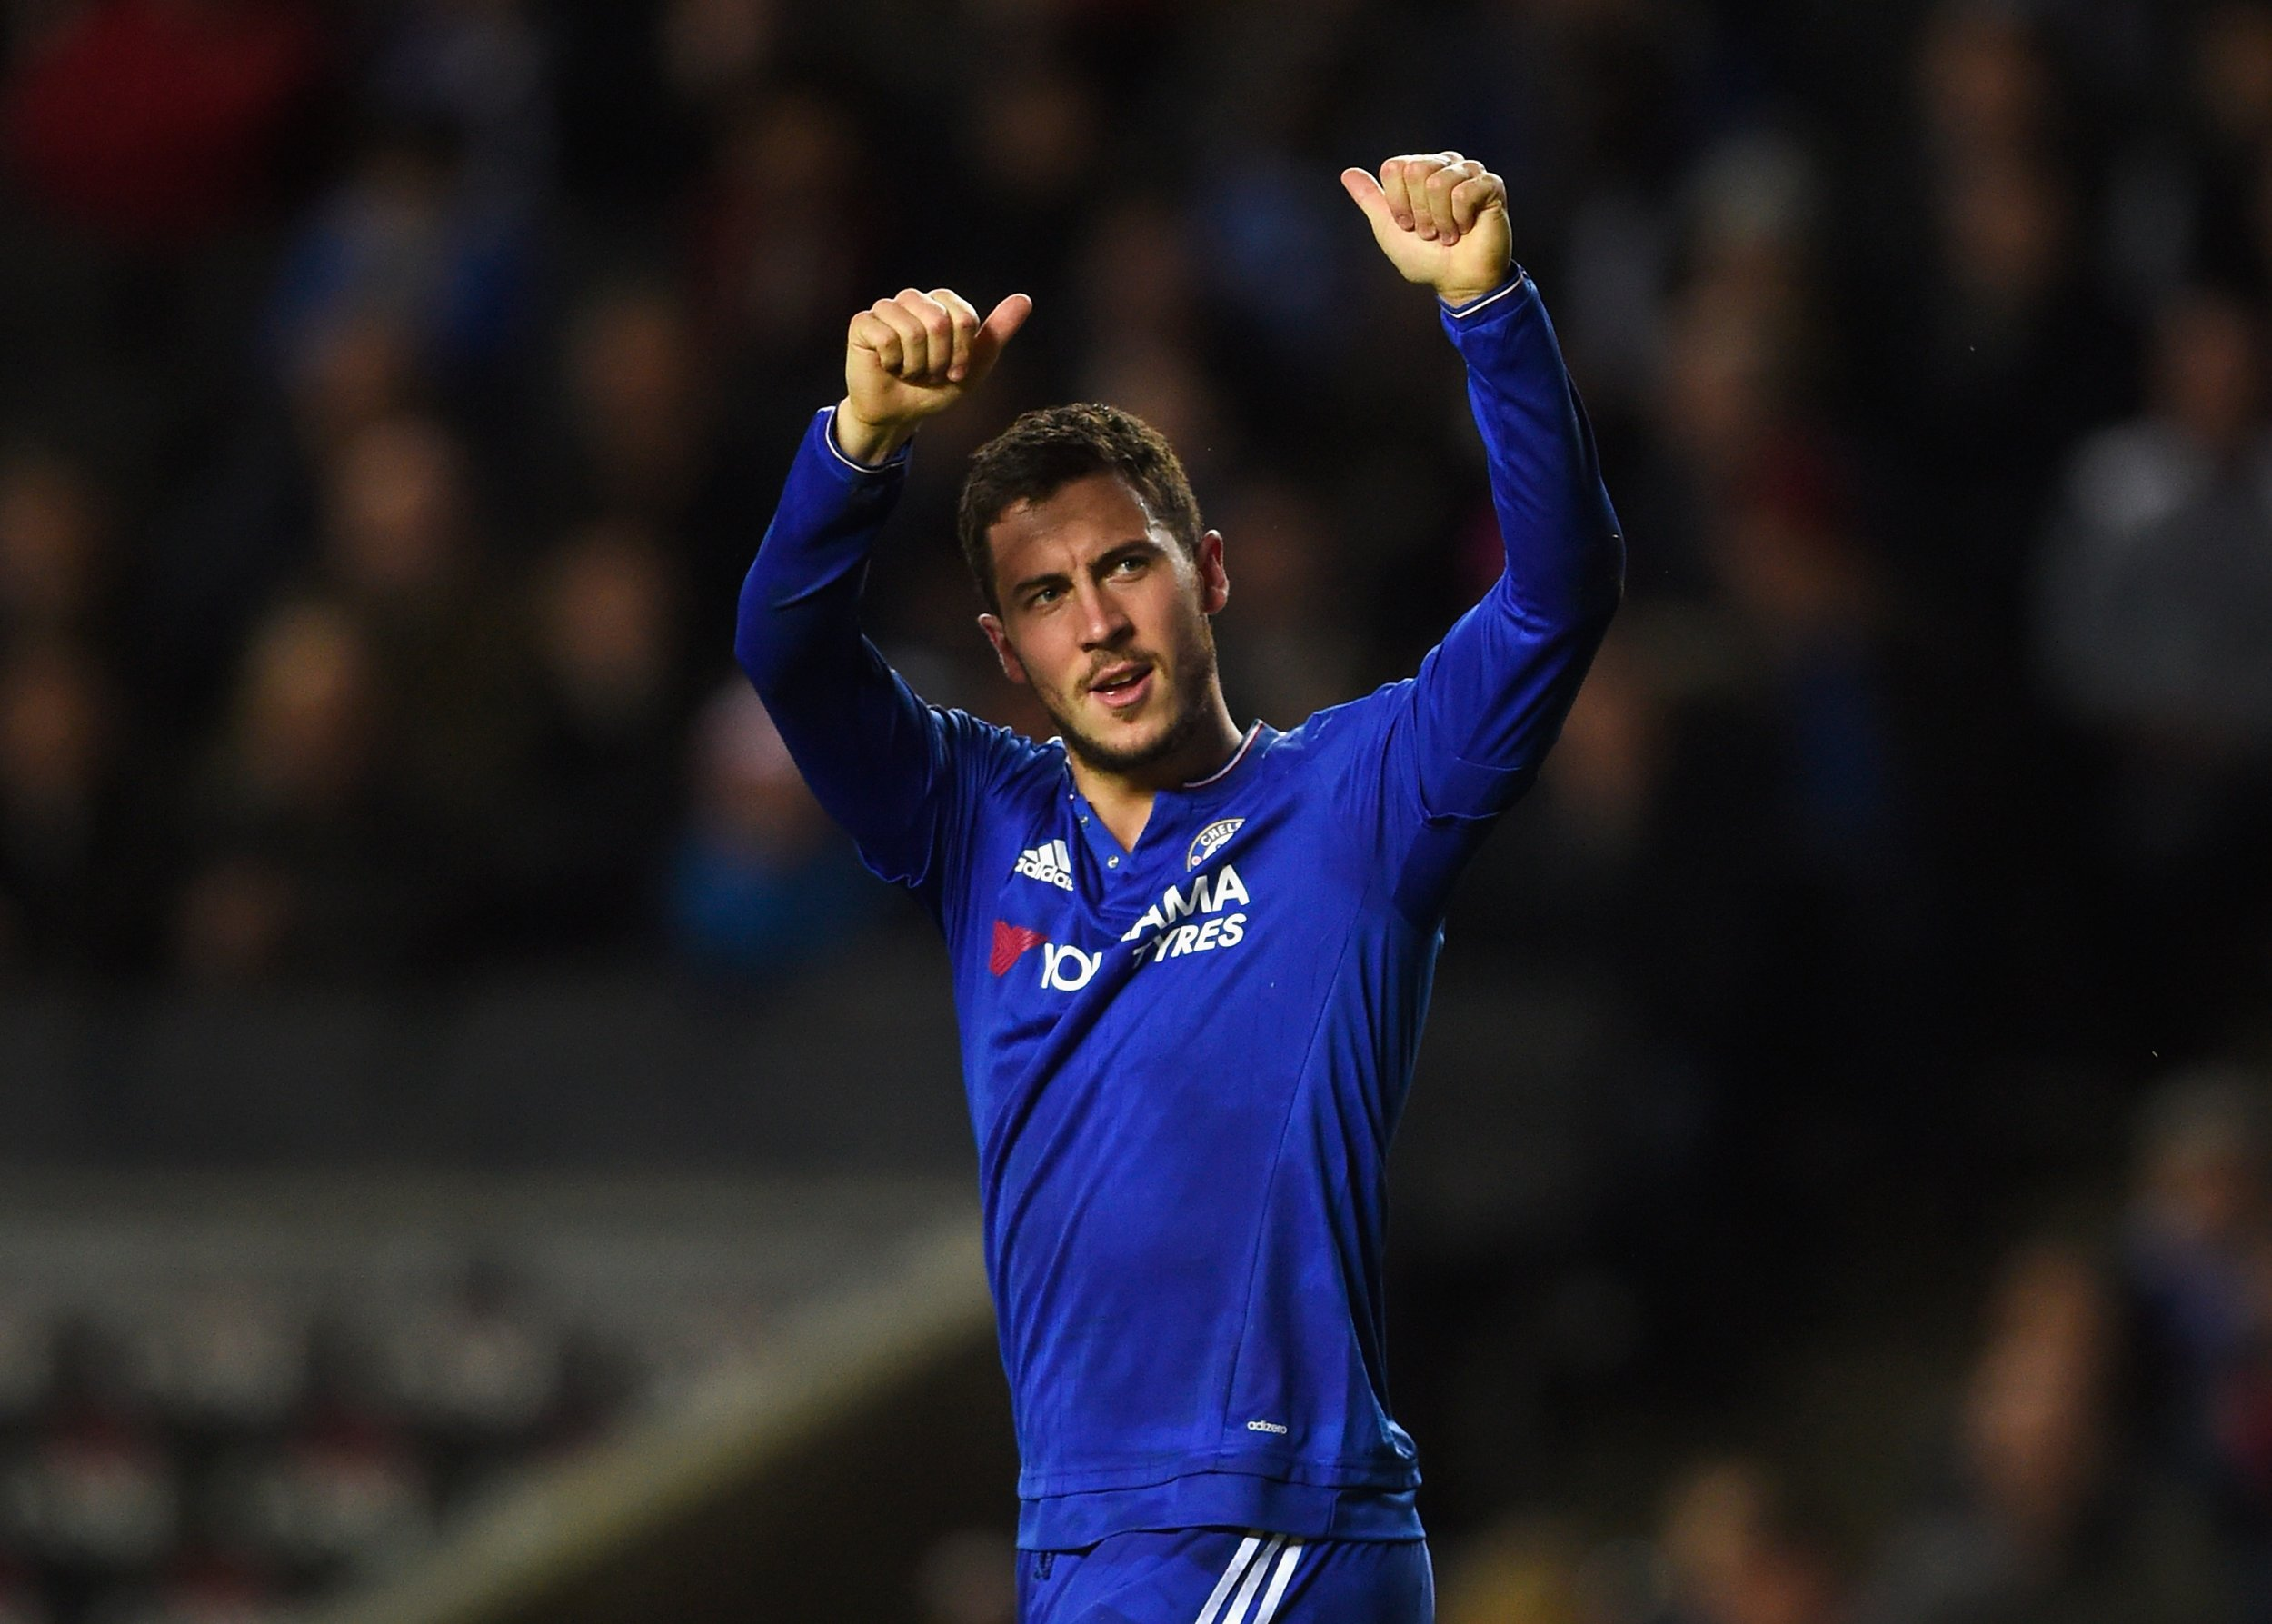 Chelsea Transfer News: Who Could Sign Star Winger Eden Hazard?